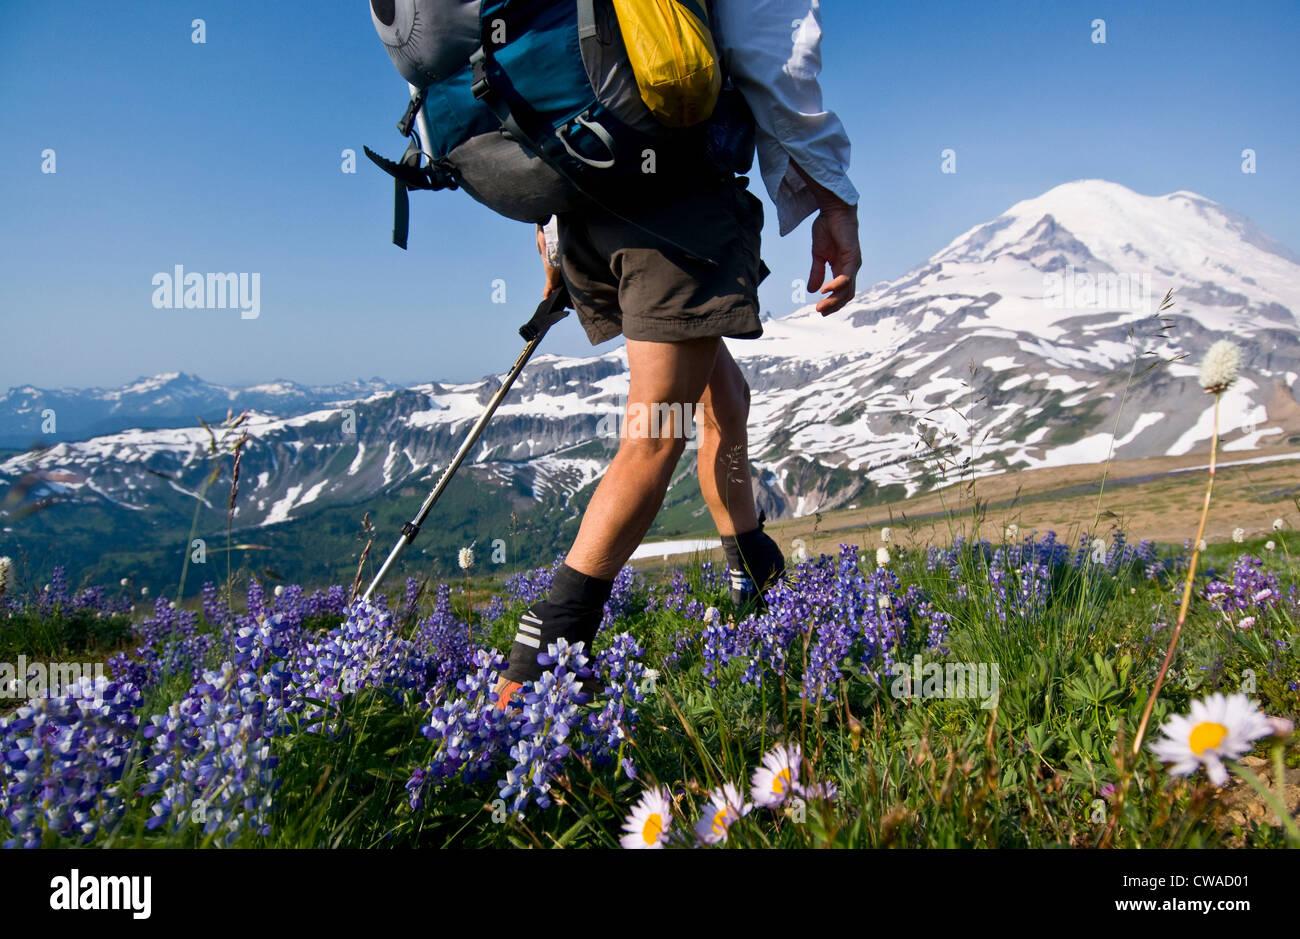 Female backpacker on Cowlitz Divide, Mount Rainier National Park, Washington, USA - Stock Image